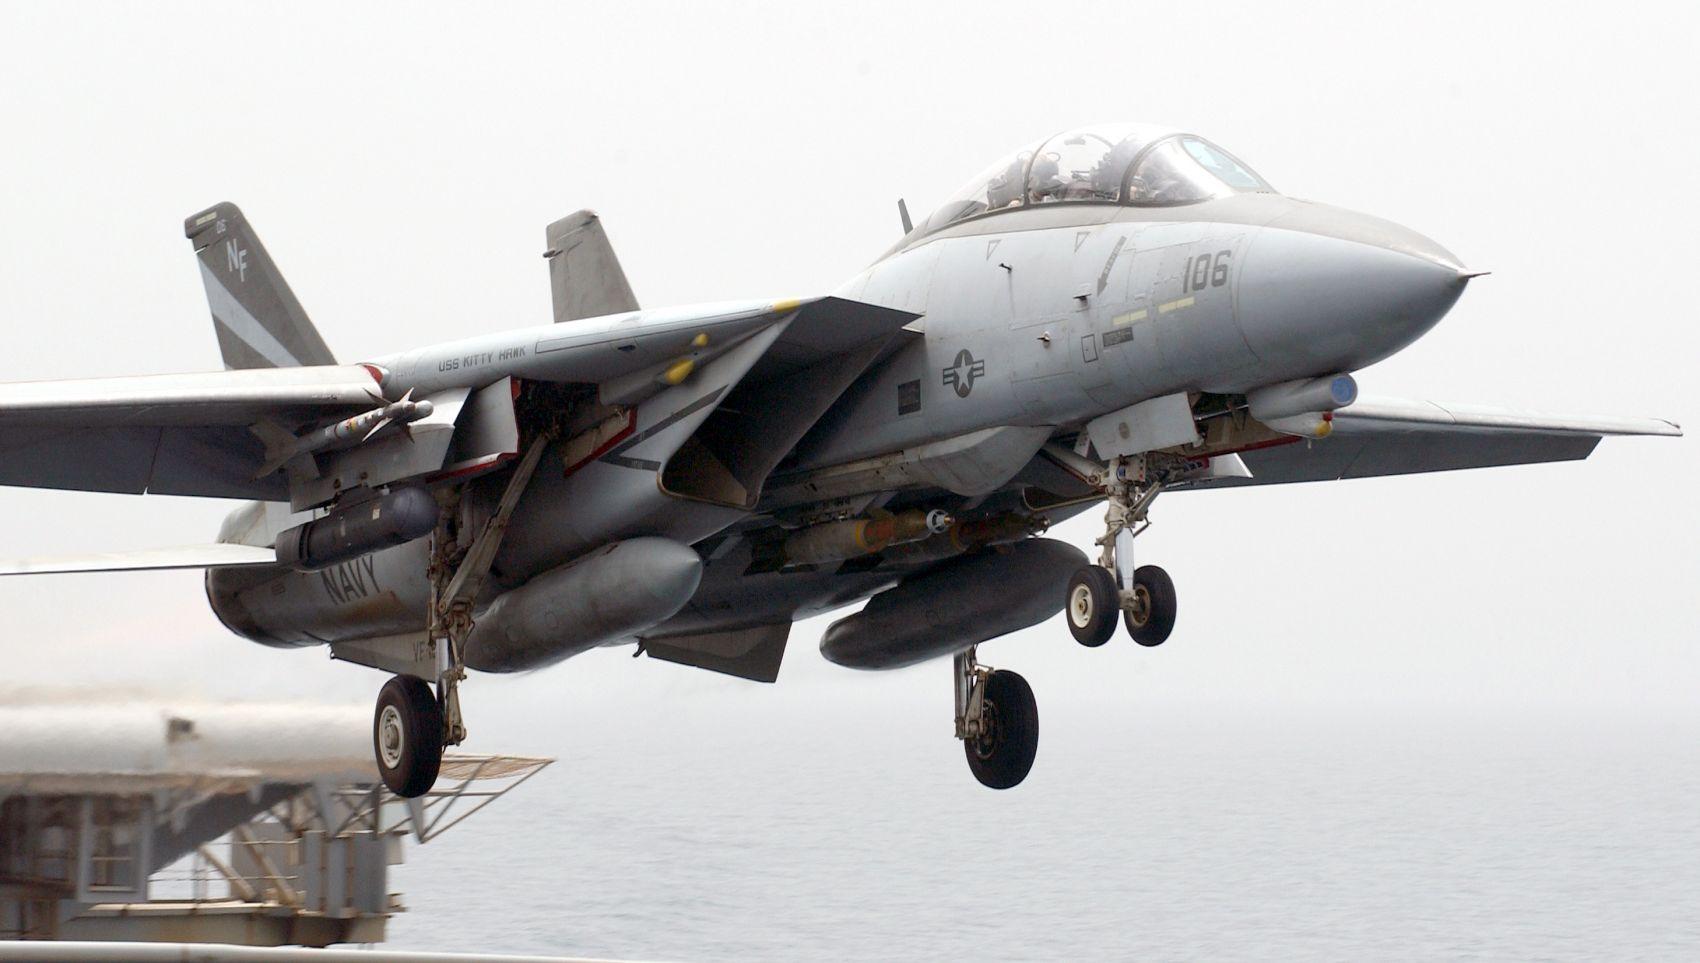 F-14 Tomcat startuje z lotniskowca USS Kitty Hawk (CV 63) (fot. US Navy / Photographer's Mate 3rd Class Todd Frantom)